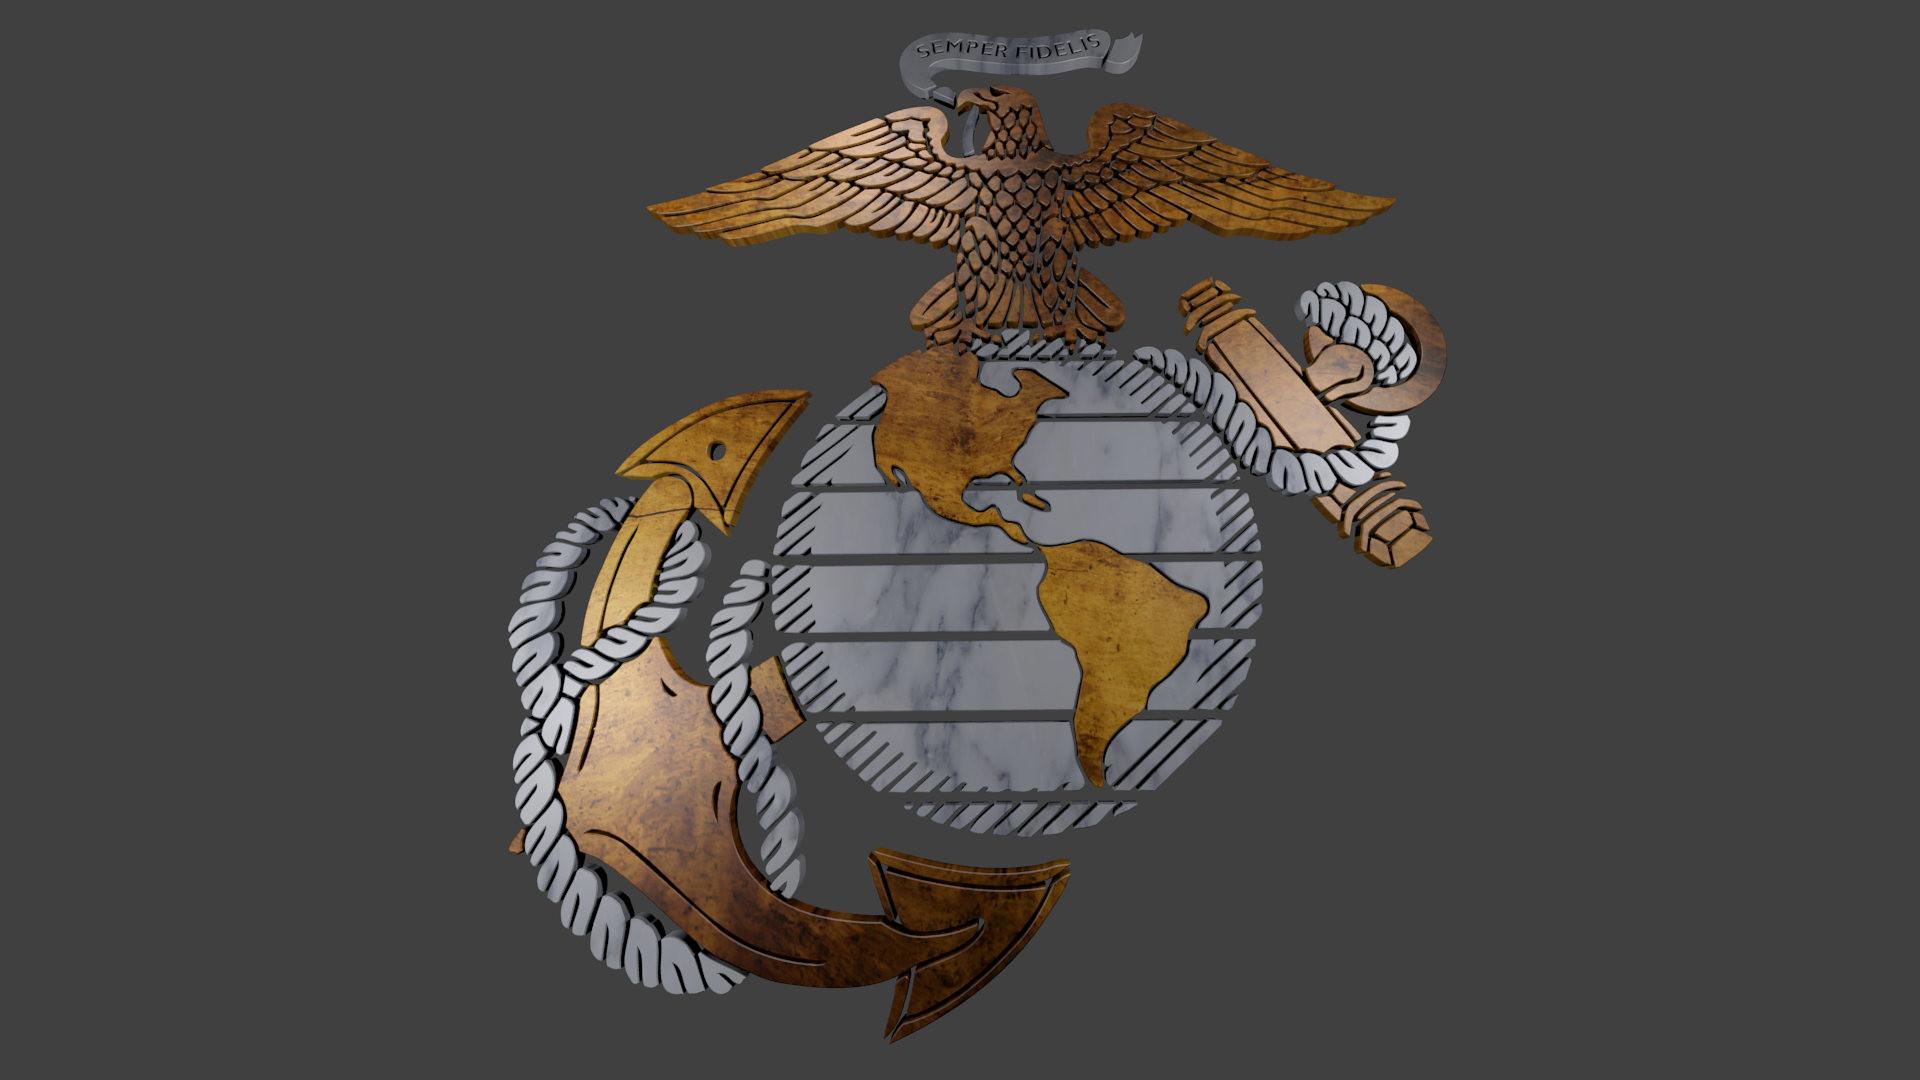 Marines USMC military wallpaper | | 46656 | WallpaperUP